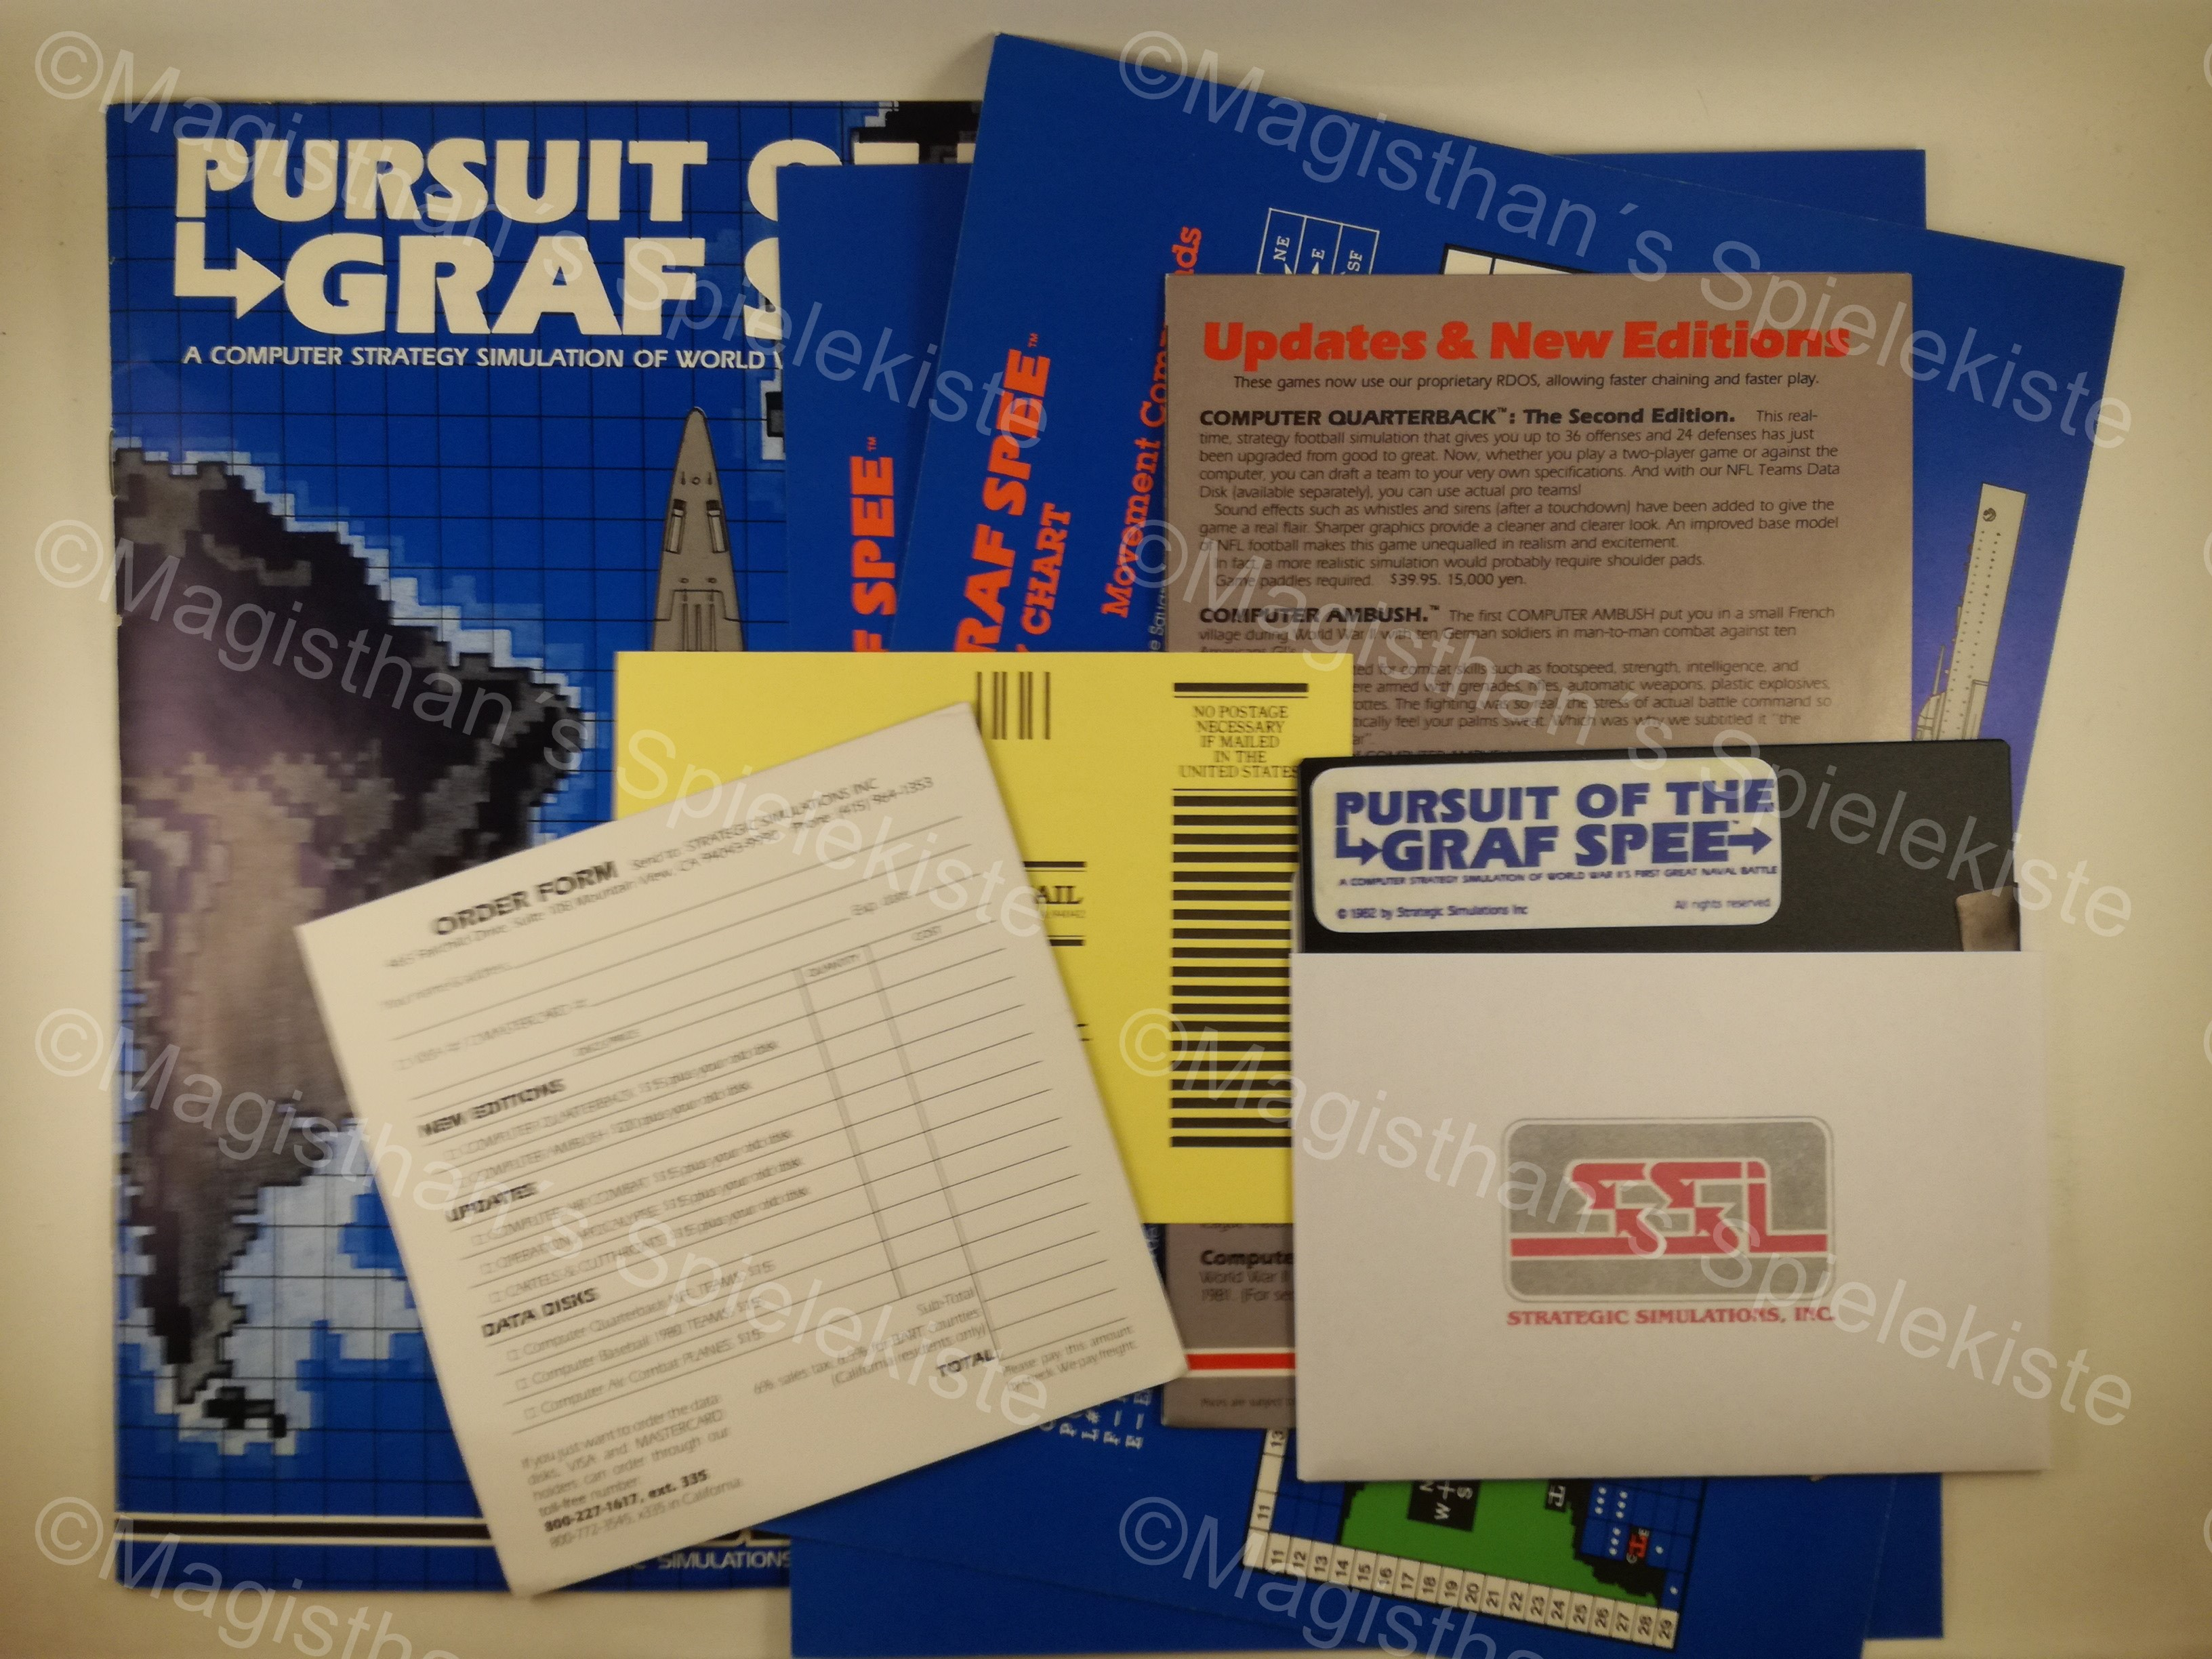 Pursuit_of_the_Graf_Spee2.jpg